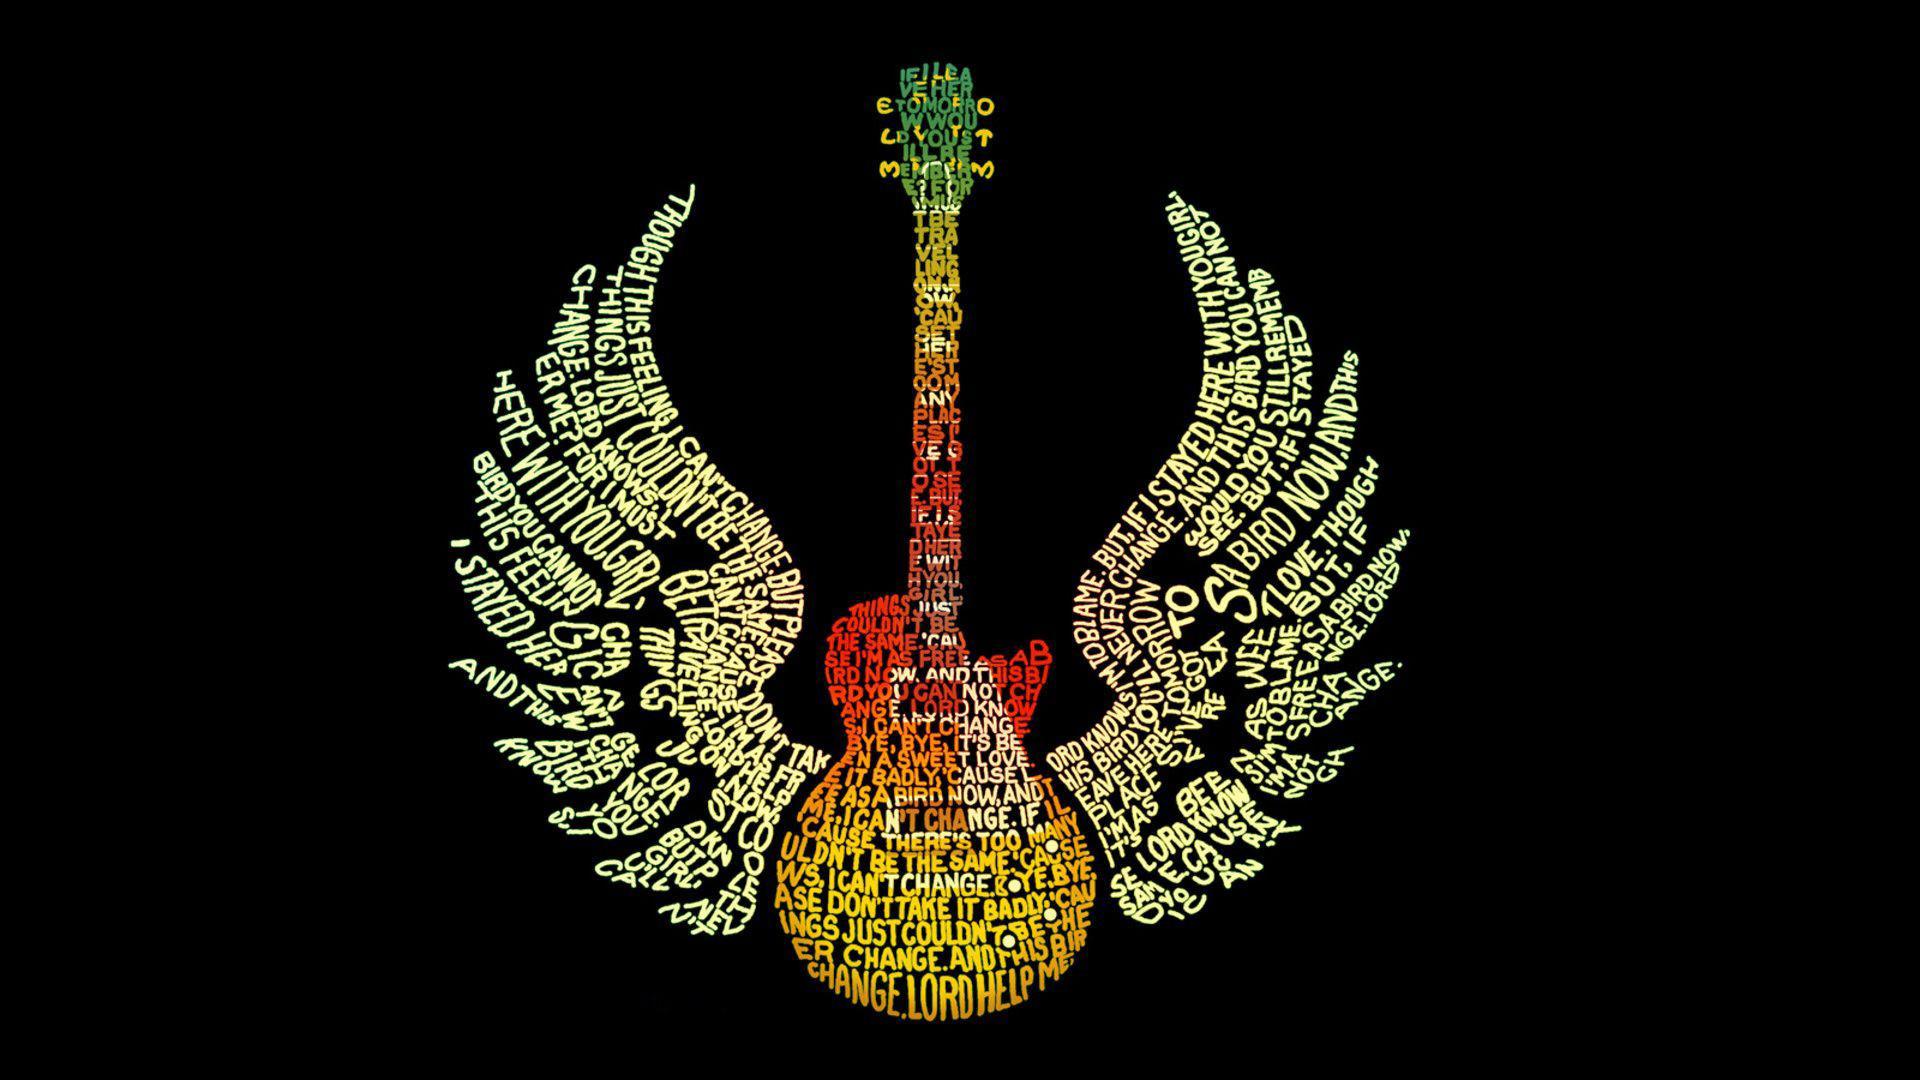 … electric guitar wallpapers hd wallpapercraft …